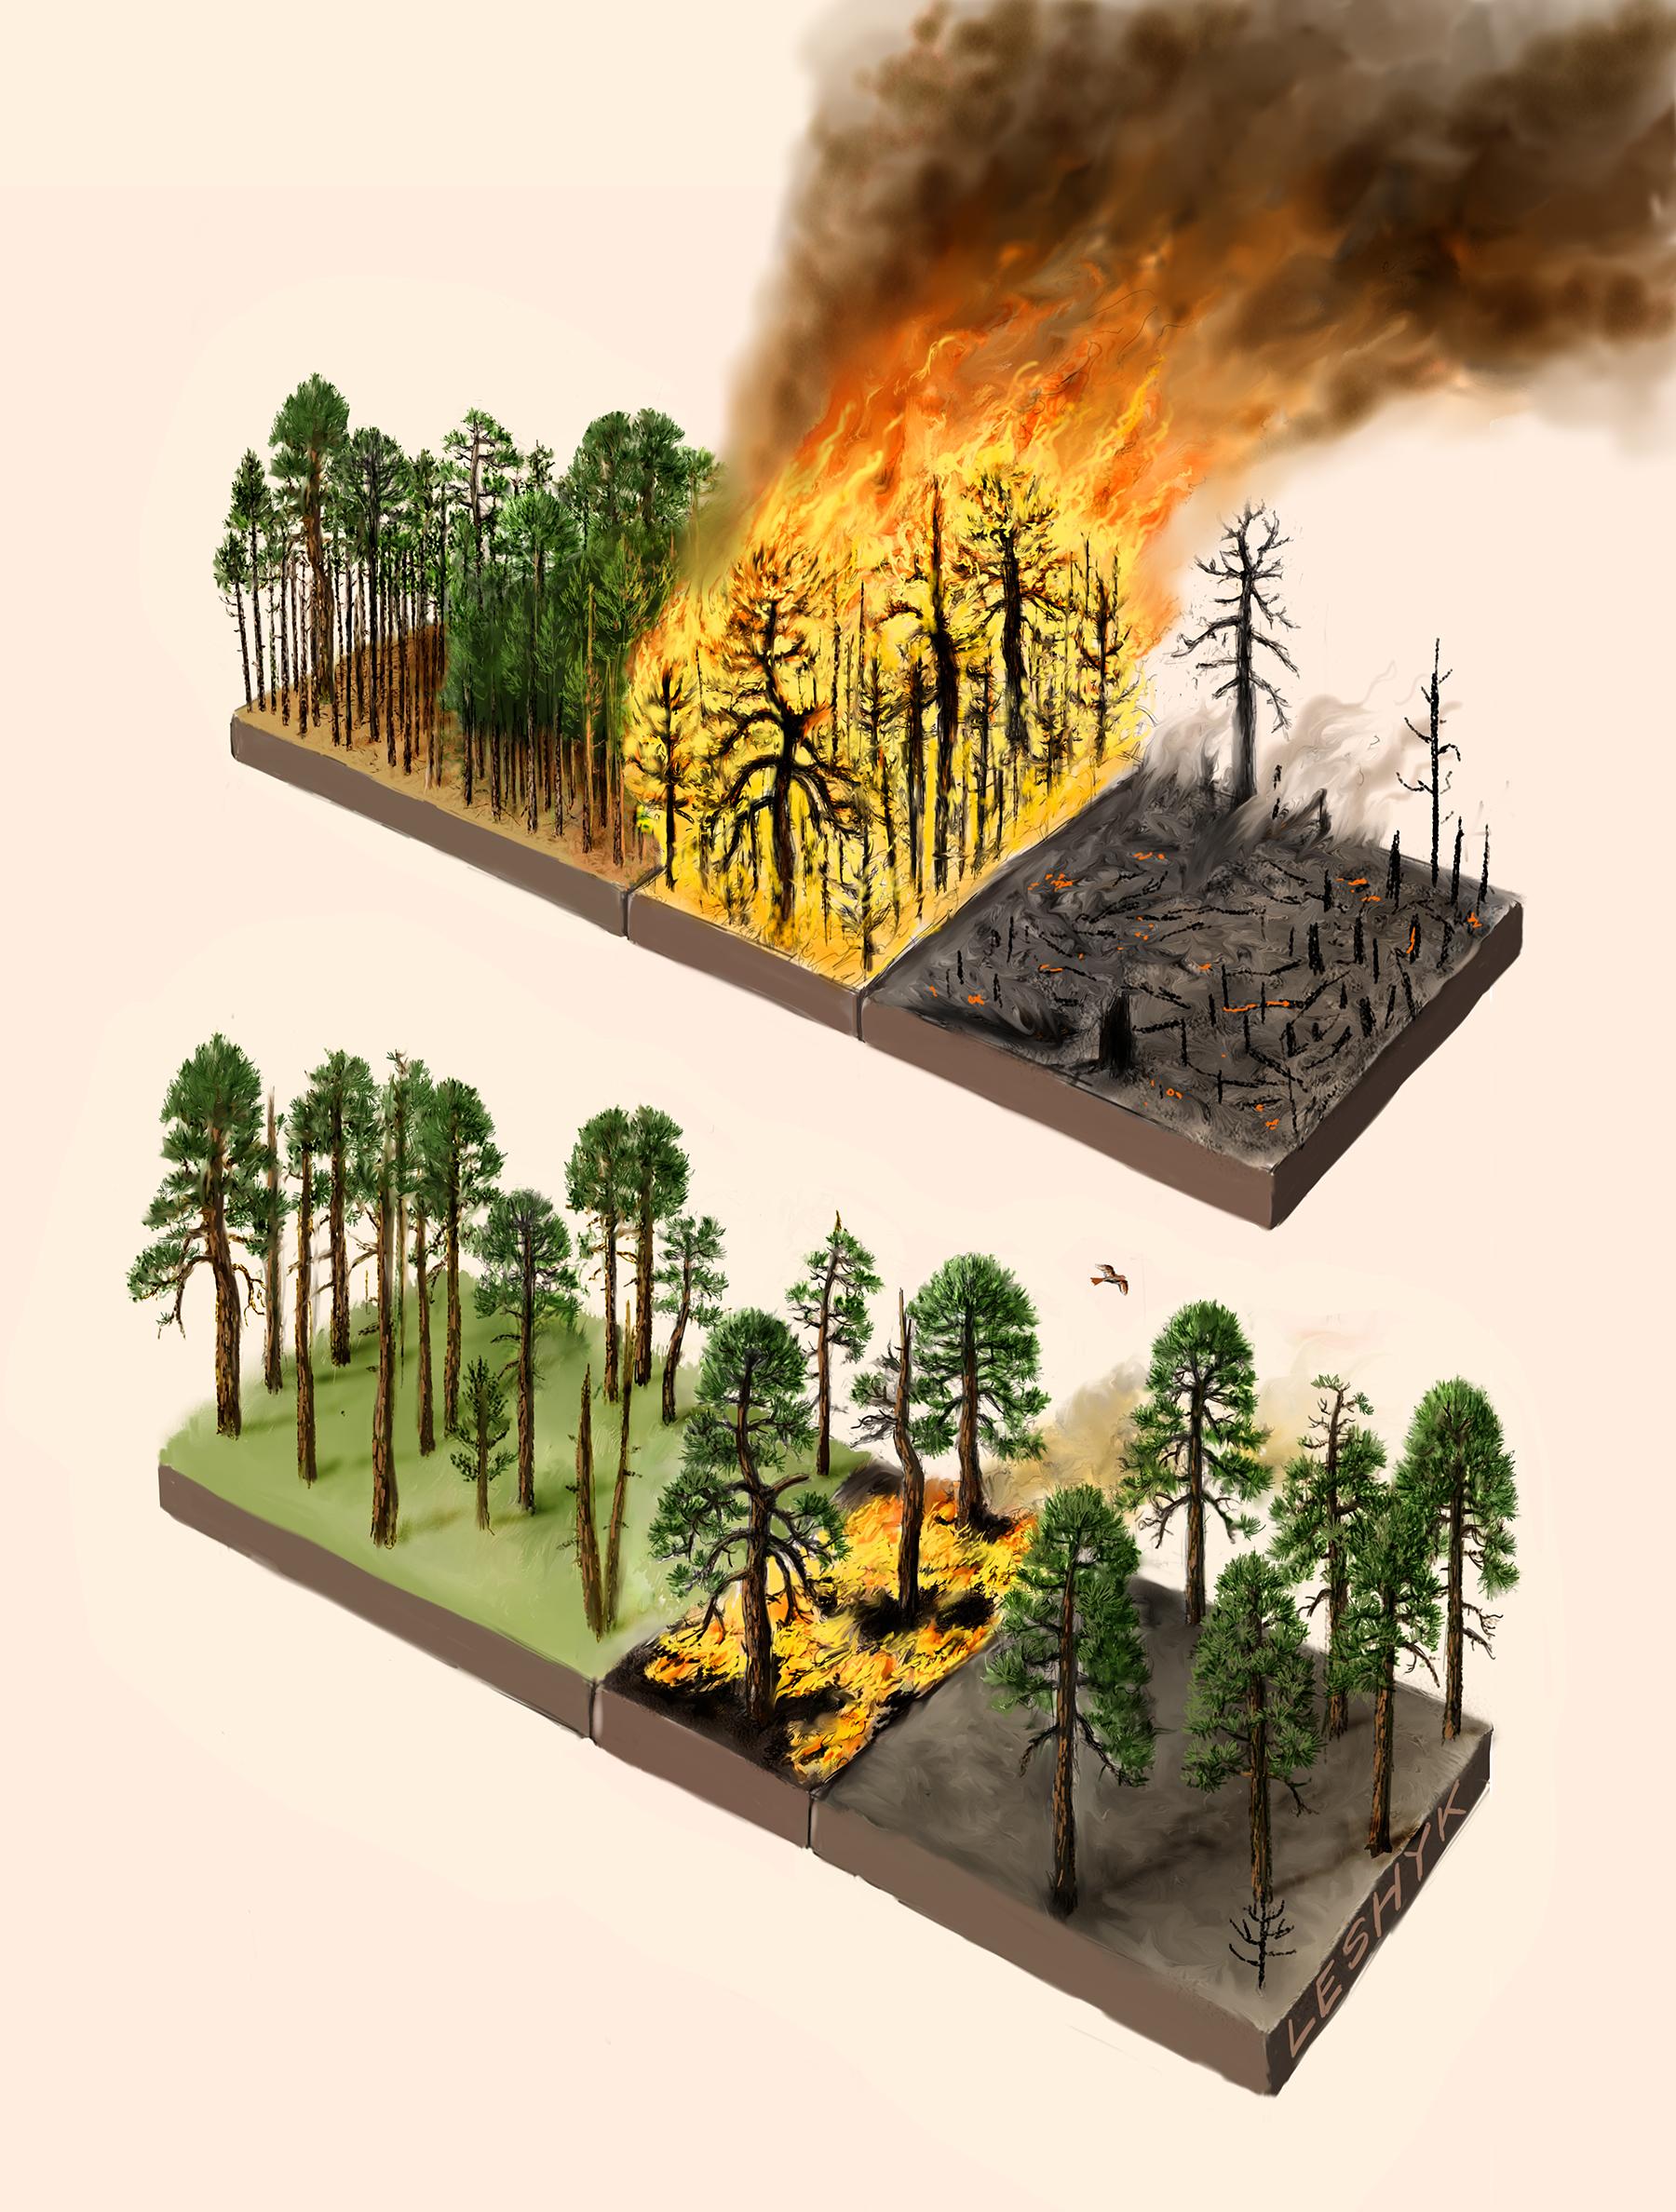 leshyk illustration carbon management